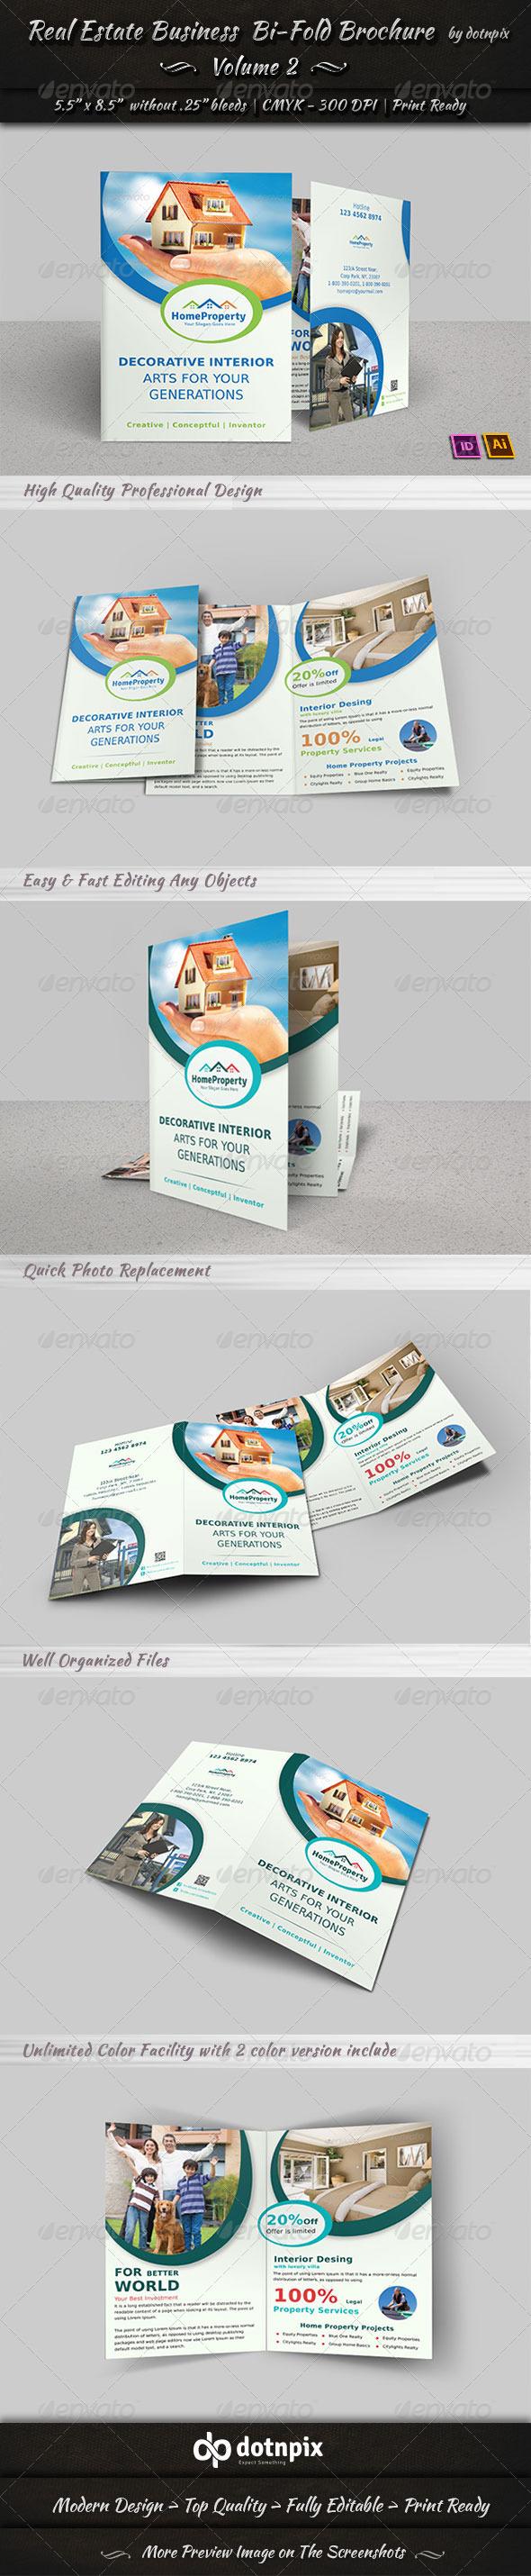 GraphicRiver Real Estate Business Bi-Fold Brochure Volume 2 6641120